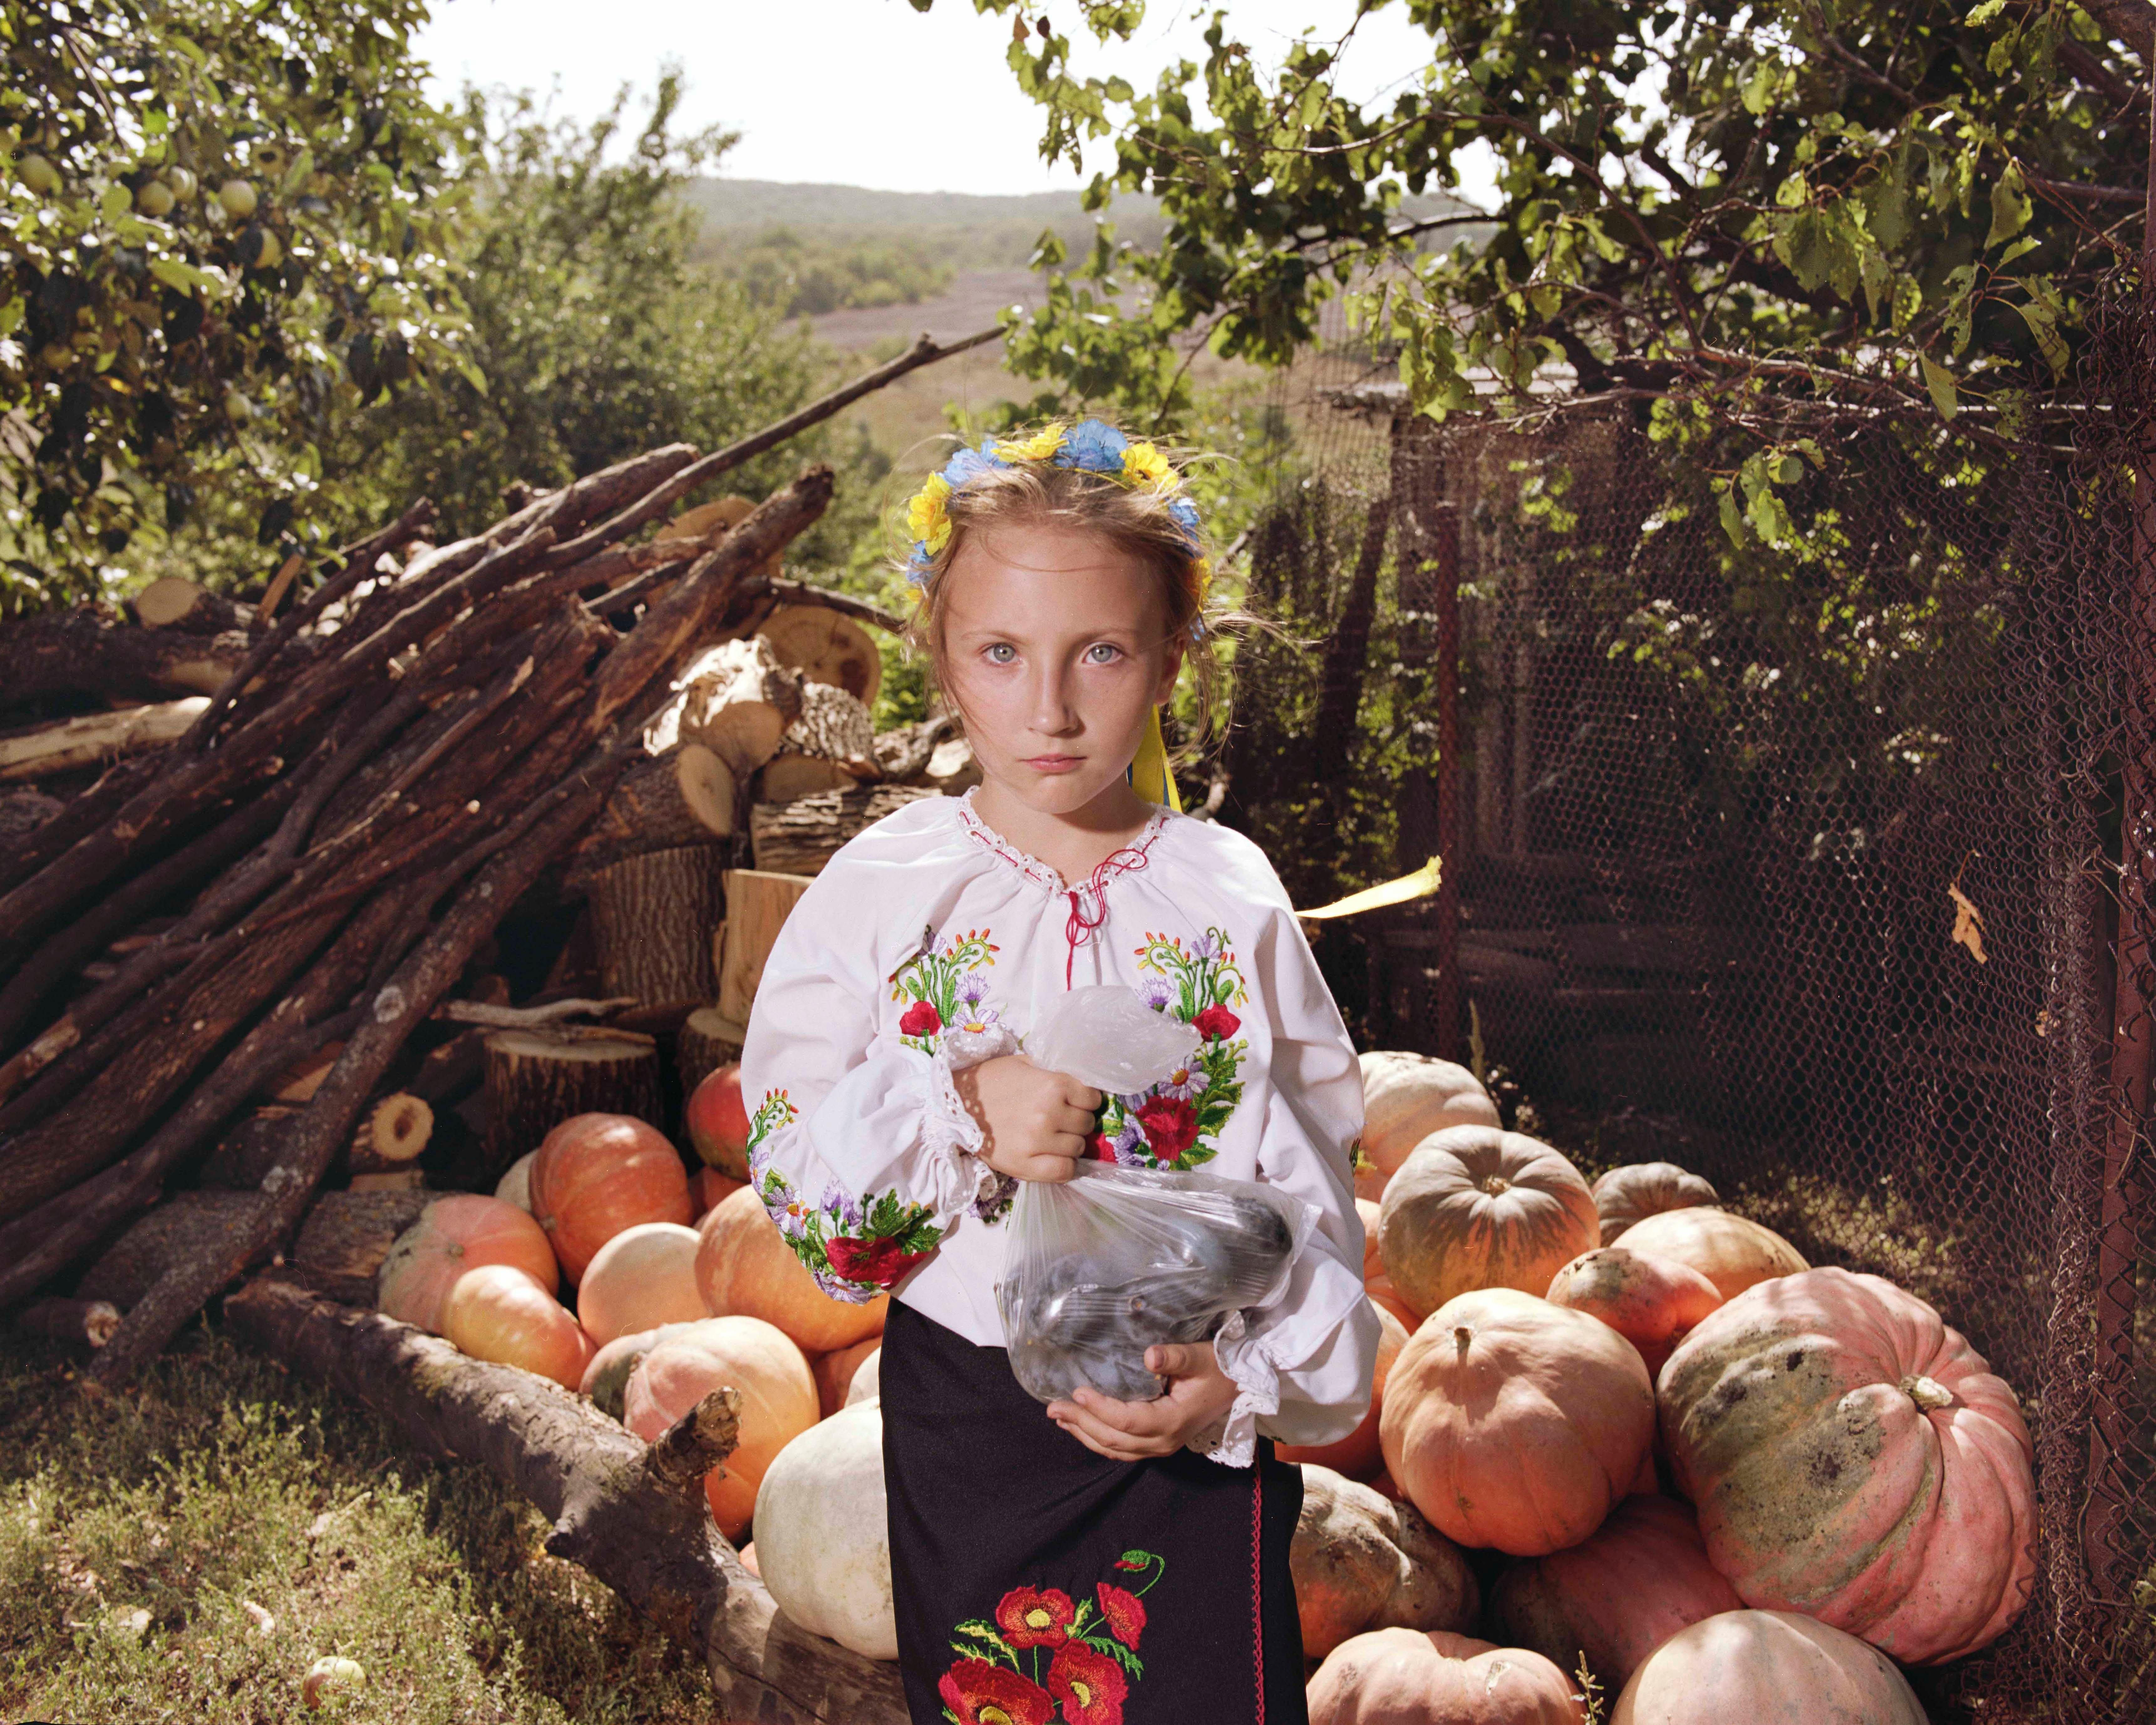 The big picture: national pride flourishes amid war in Ukraine